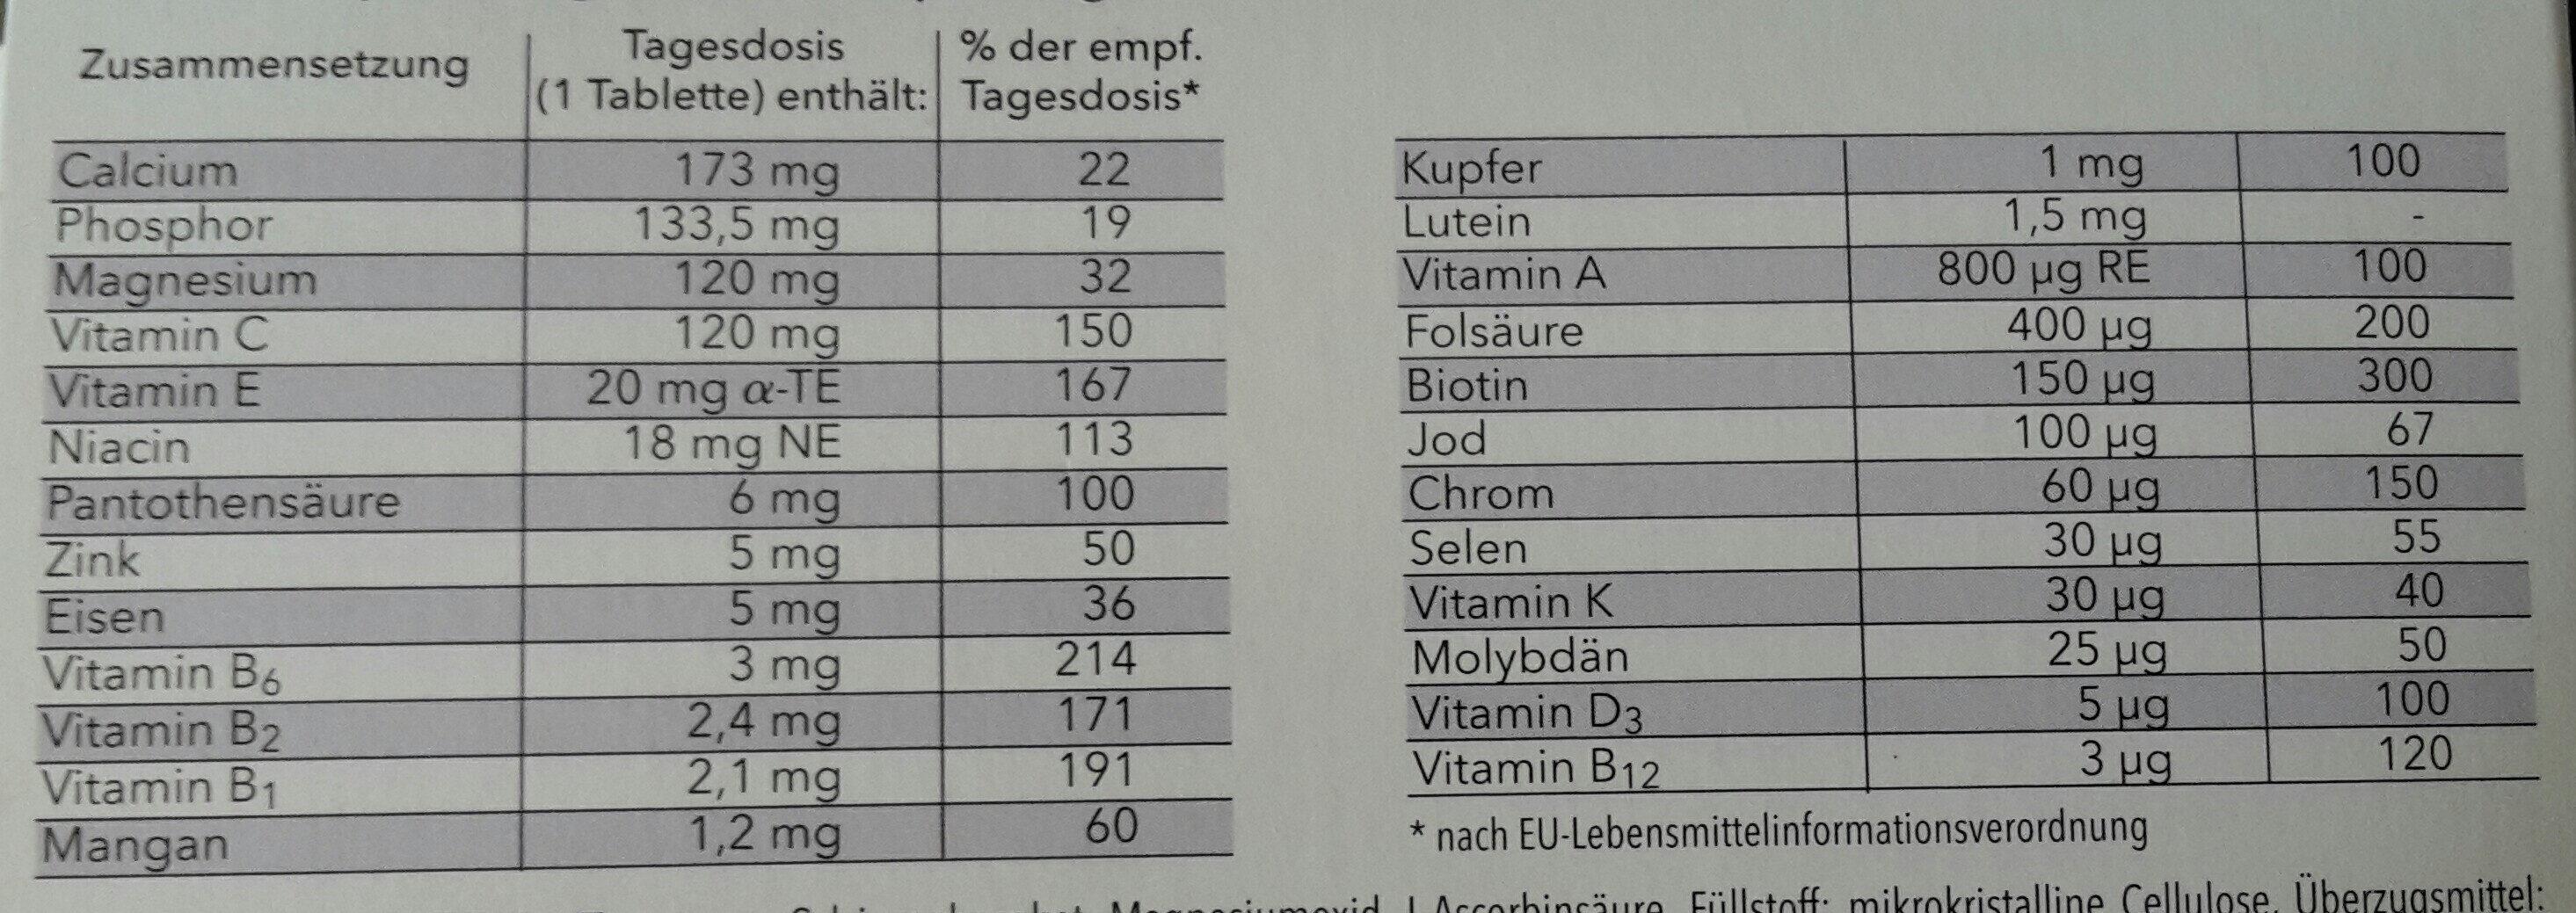 Nobilin Multivital - Nutrition facts - de